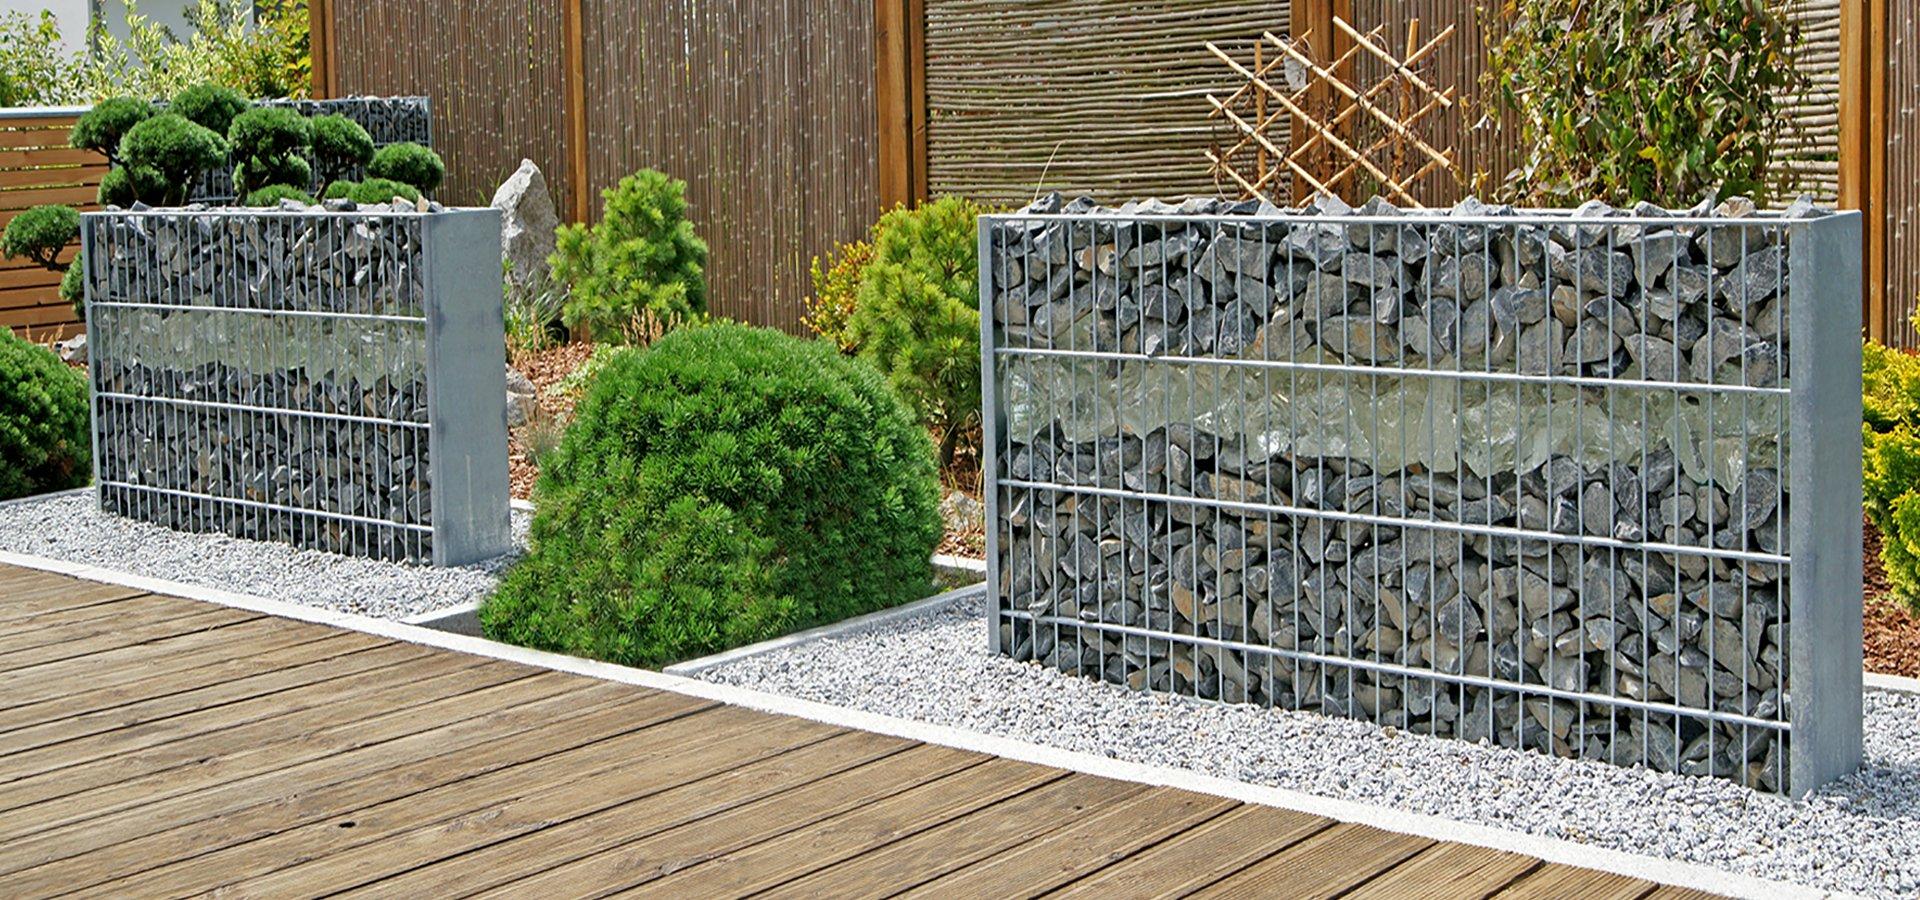 Gartendesign  Company - Kohout's Gartendesign GmbH & Co. KG - Prietitz